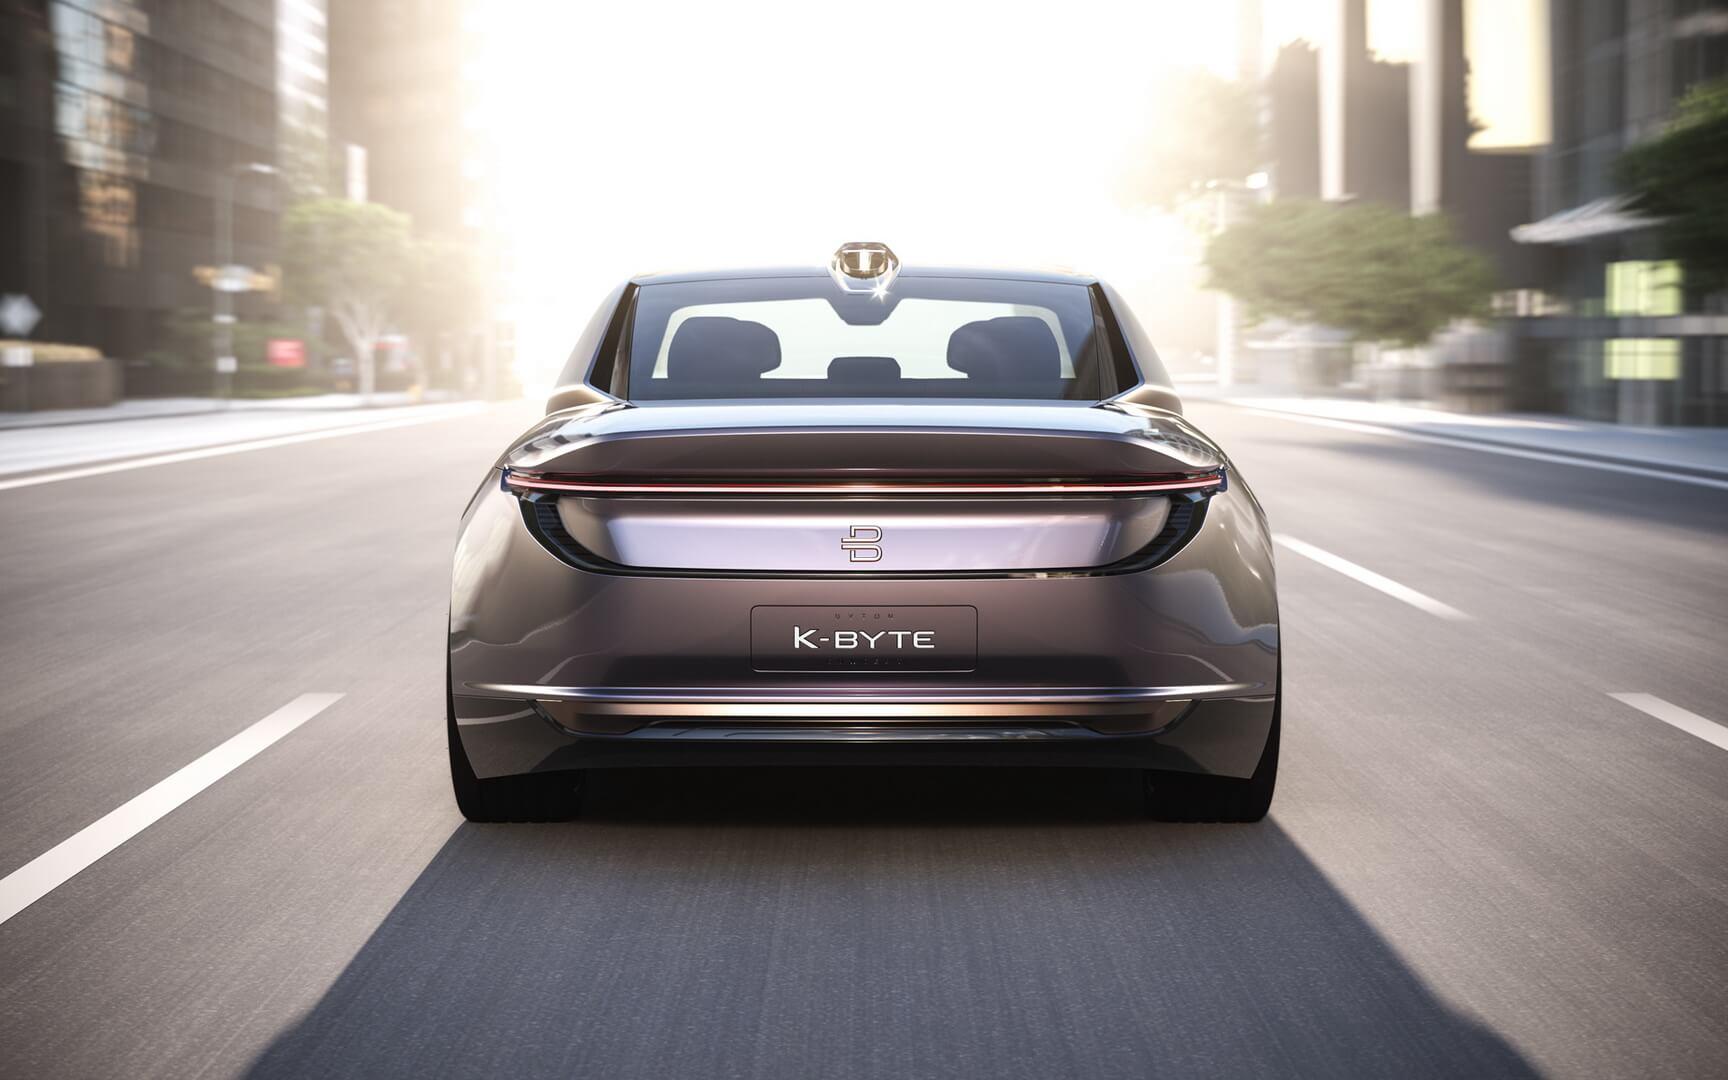 Концепт автономного электрического седана BYTON K-Byte — вид сзади